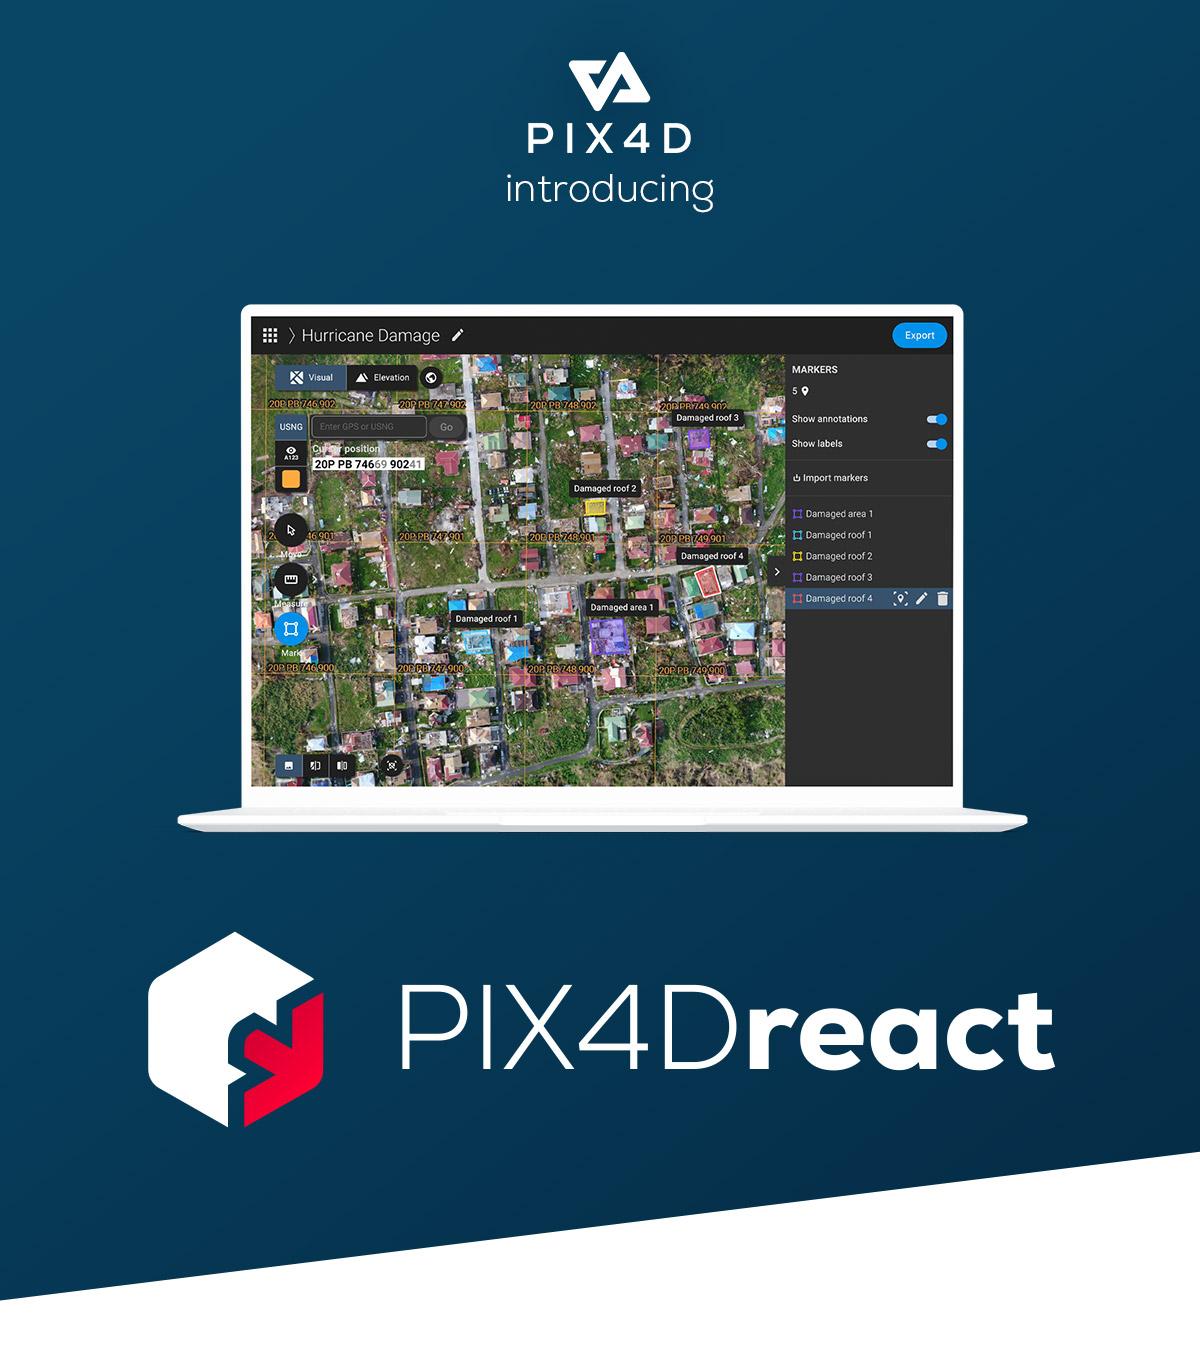 Pix4Dreact for education